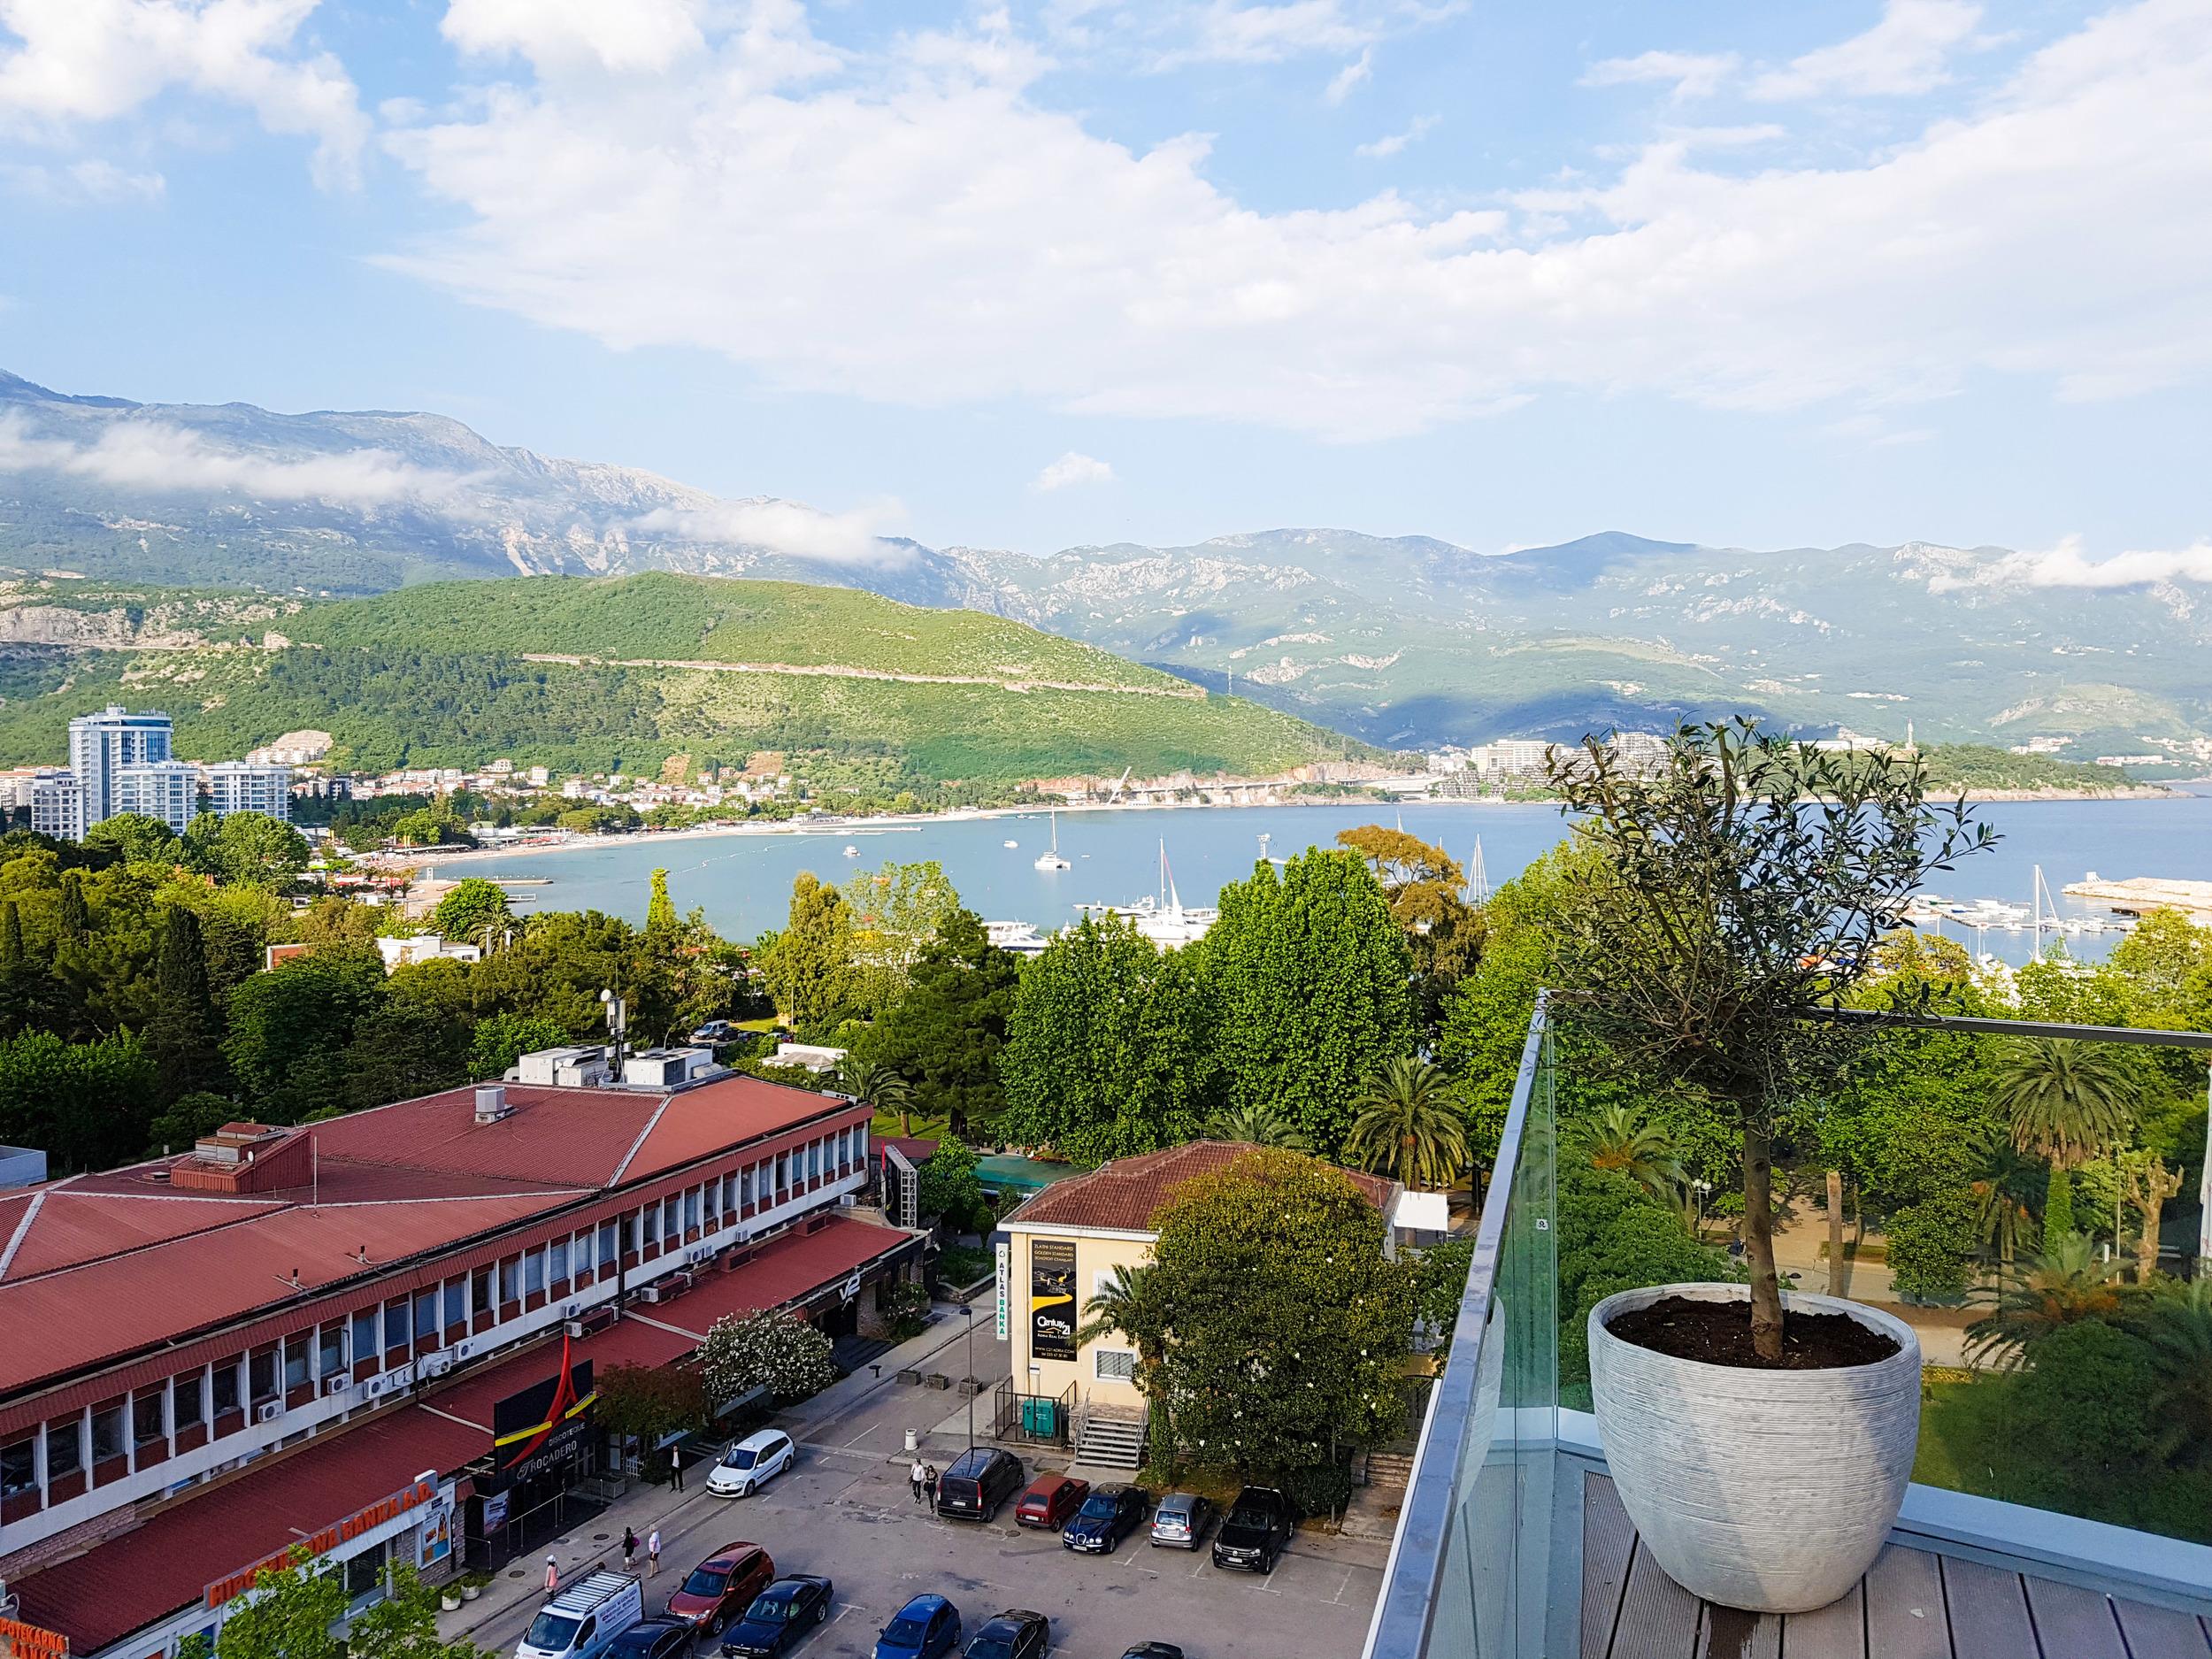 Property for sale in Budva